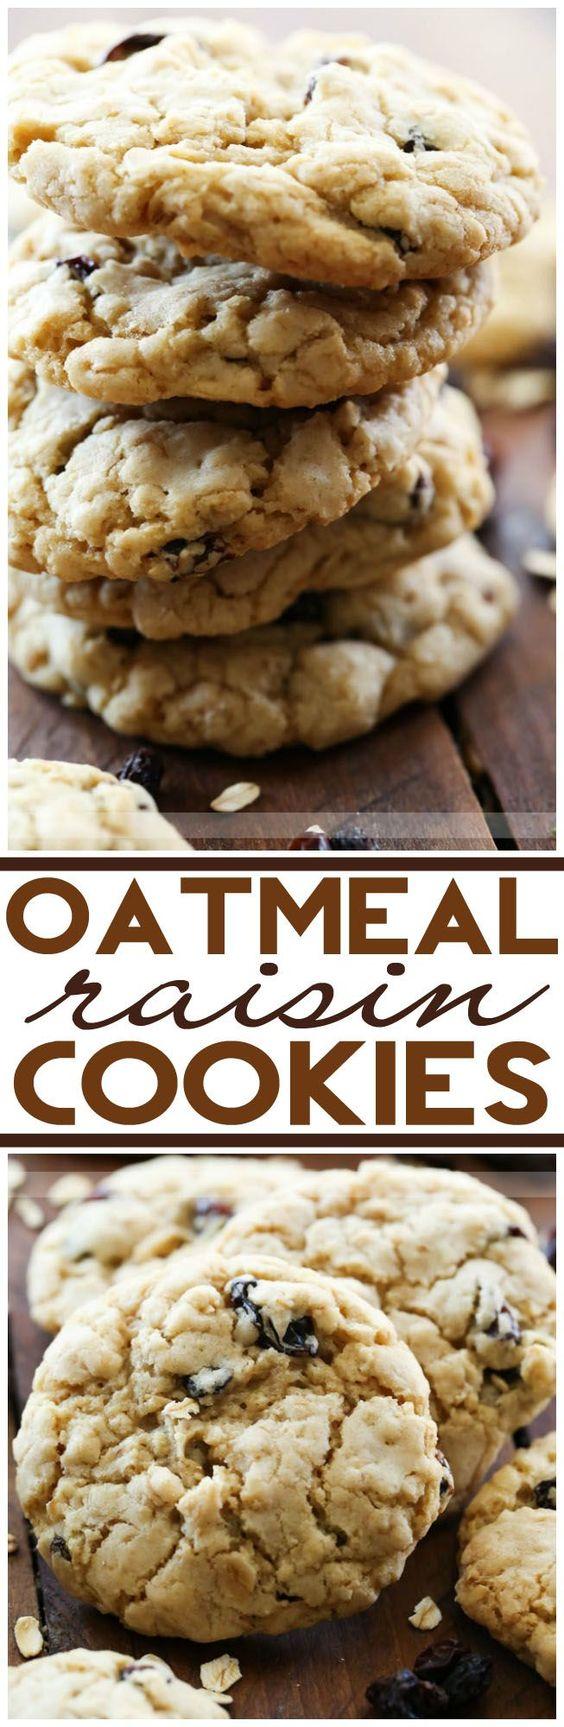 Oatmeal Raisin Cookies   Recipe   Raisin cookies, Oatmeal and Oatmeal ...